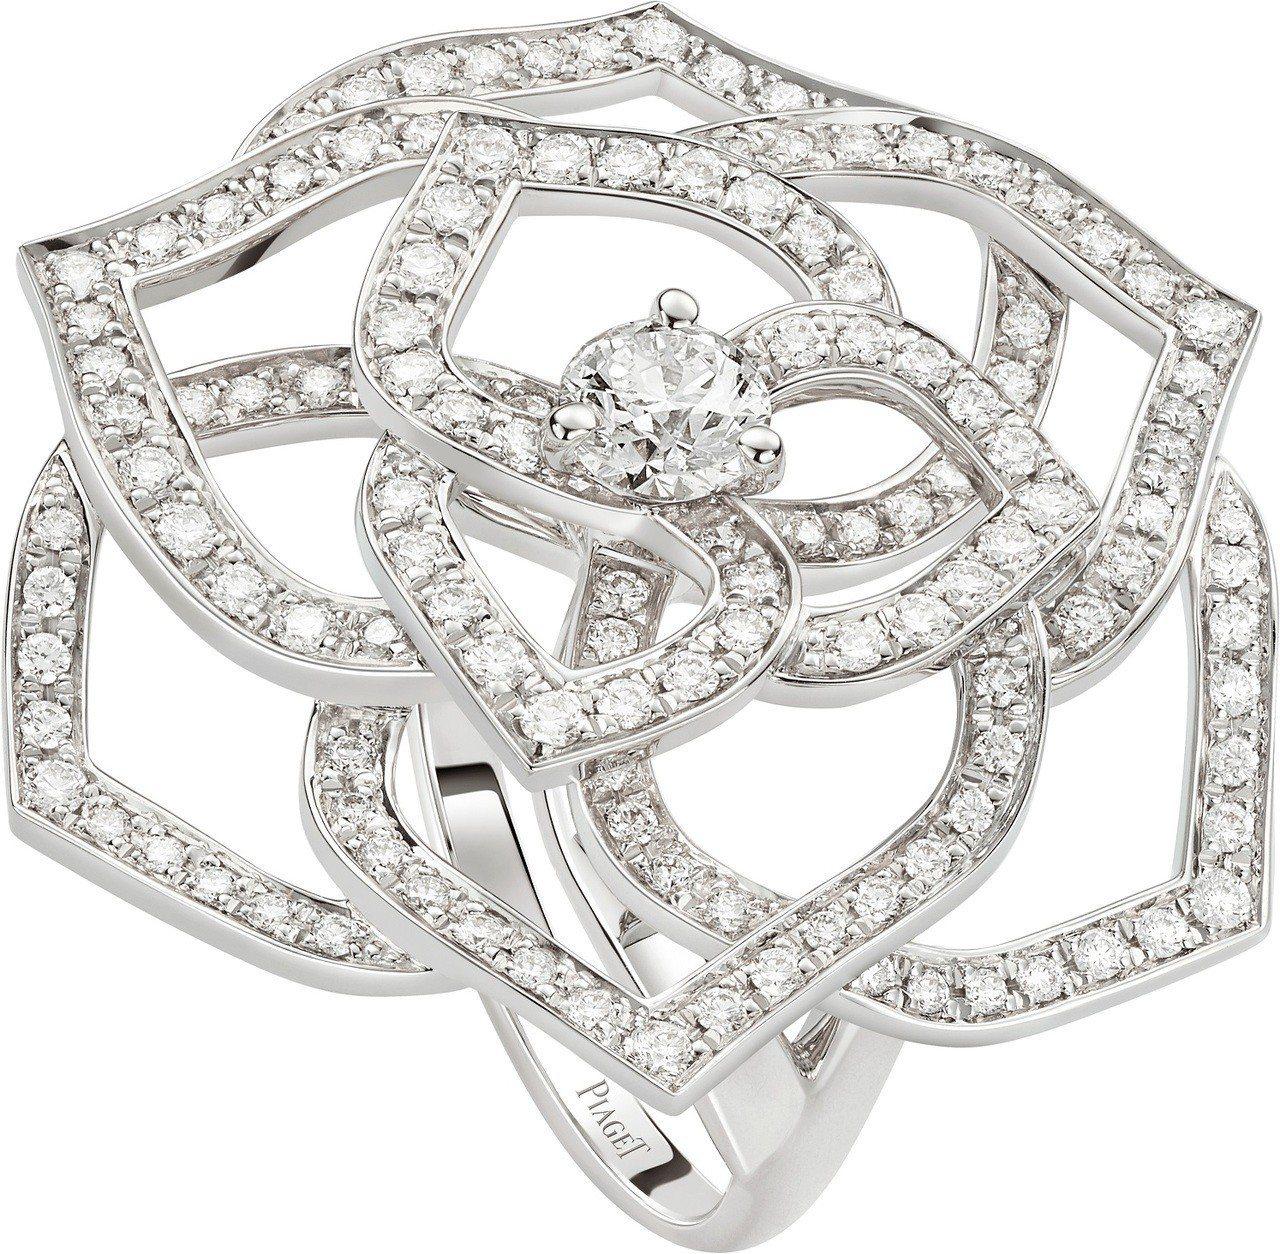 Piaget Rose系列指環,18K白金鑲嵌143顆圓形美鑽共約1.2克拉,4...